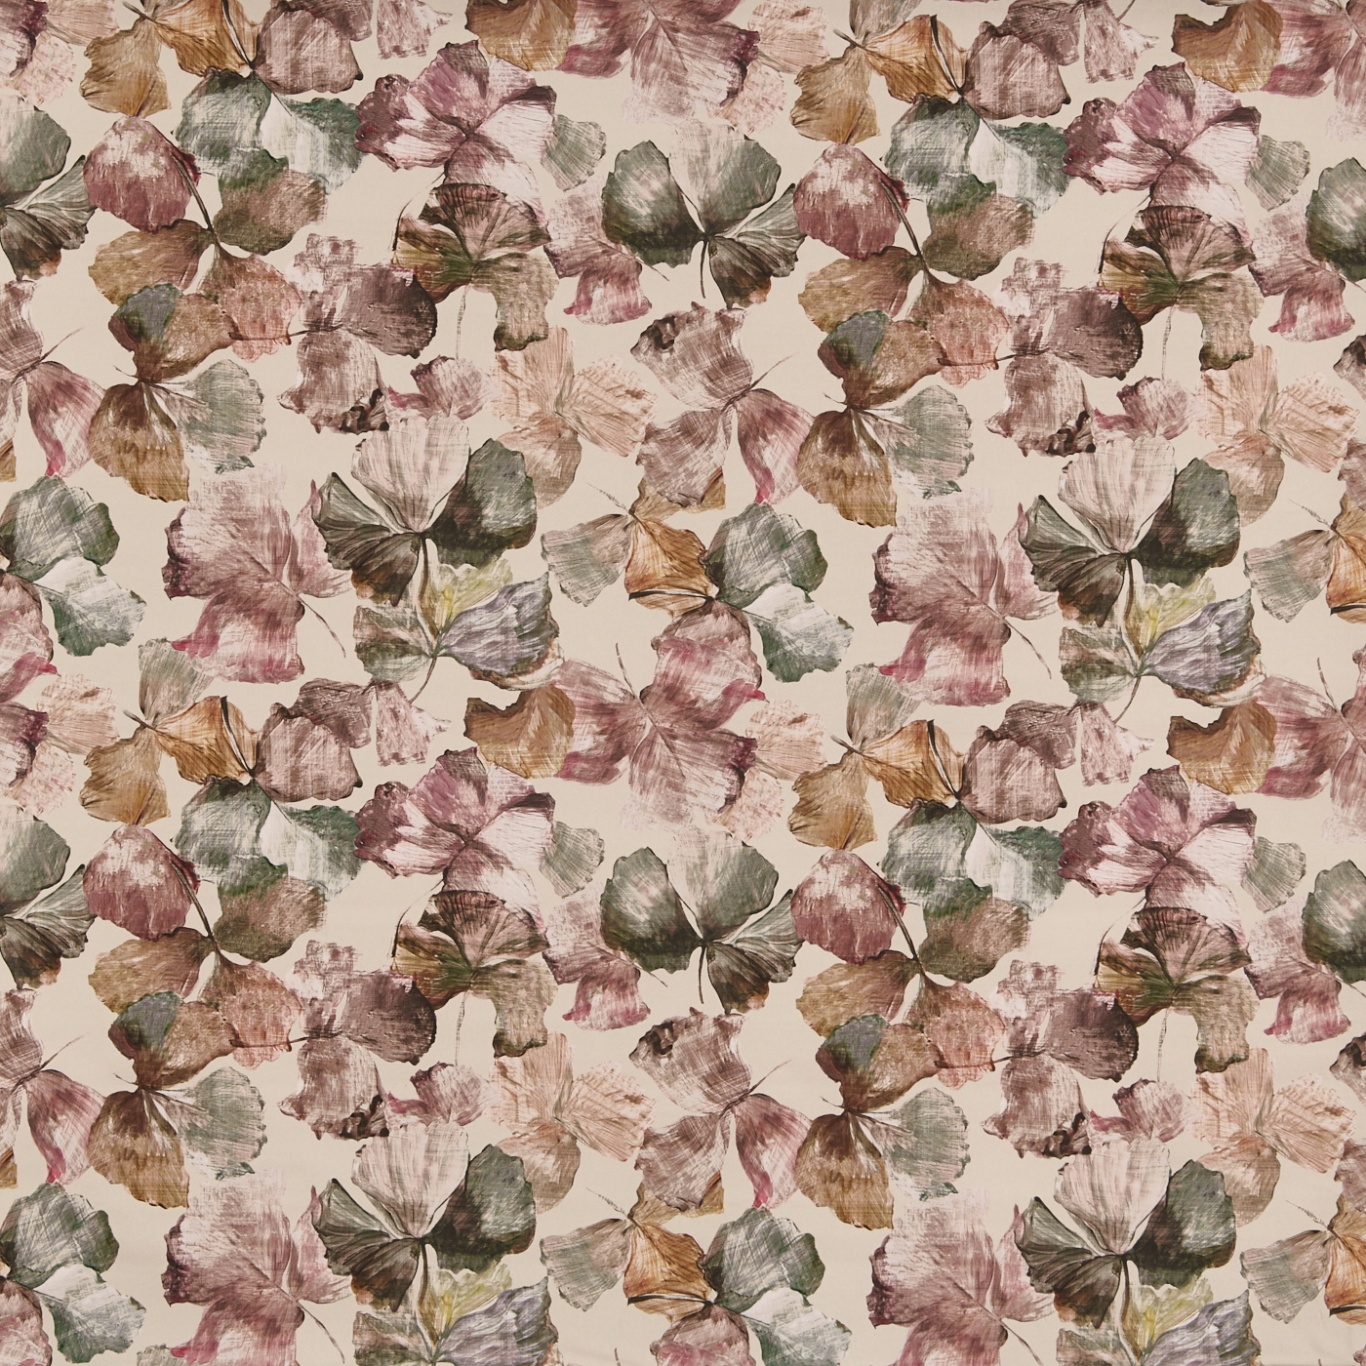 Image of Prestigious Hanalei Spice Fabric 8701/110